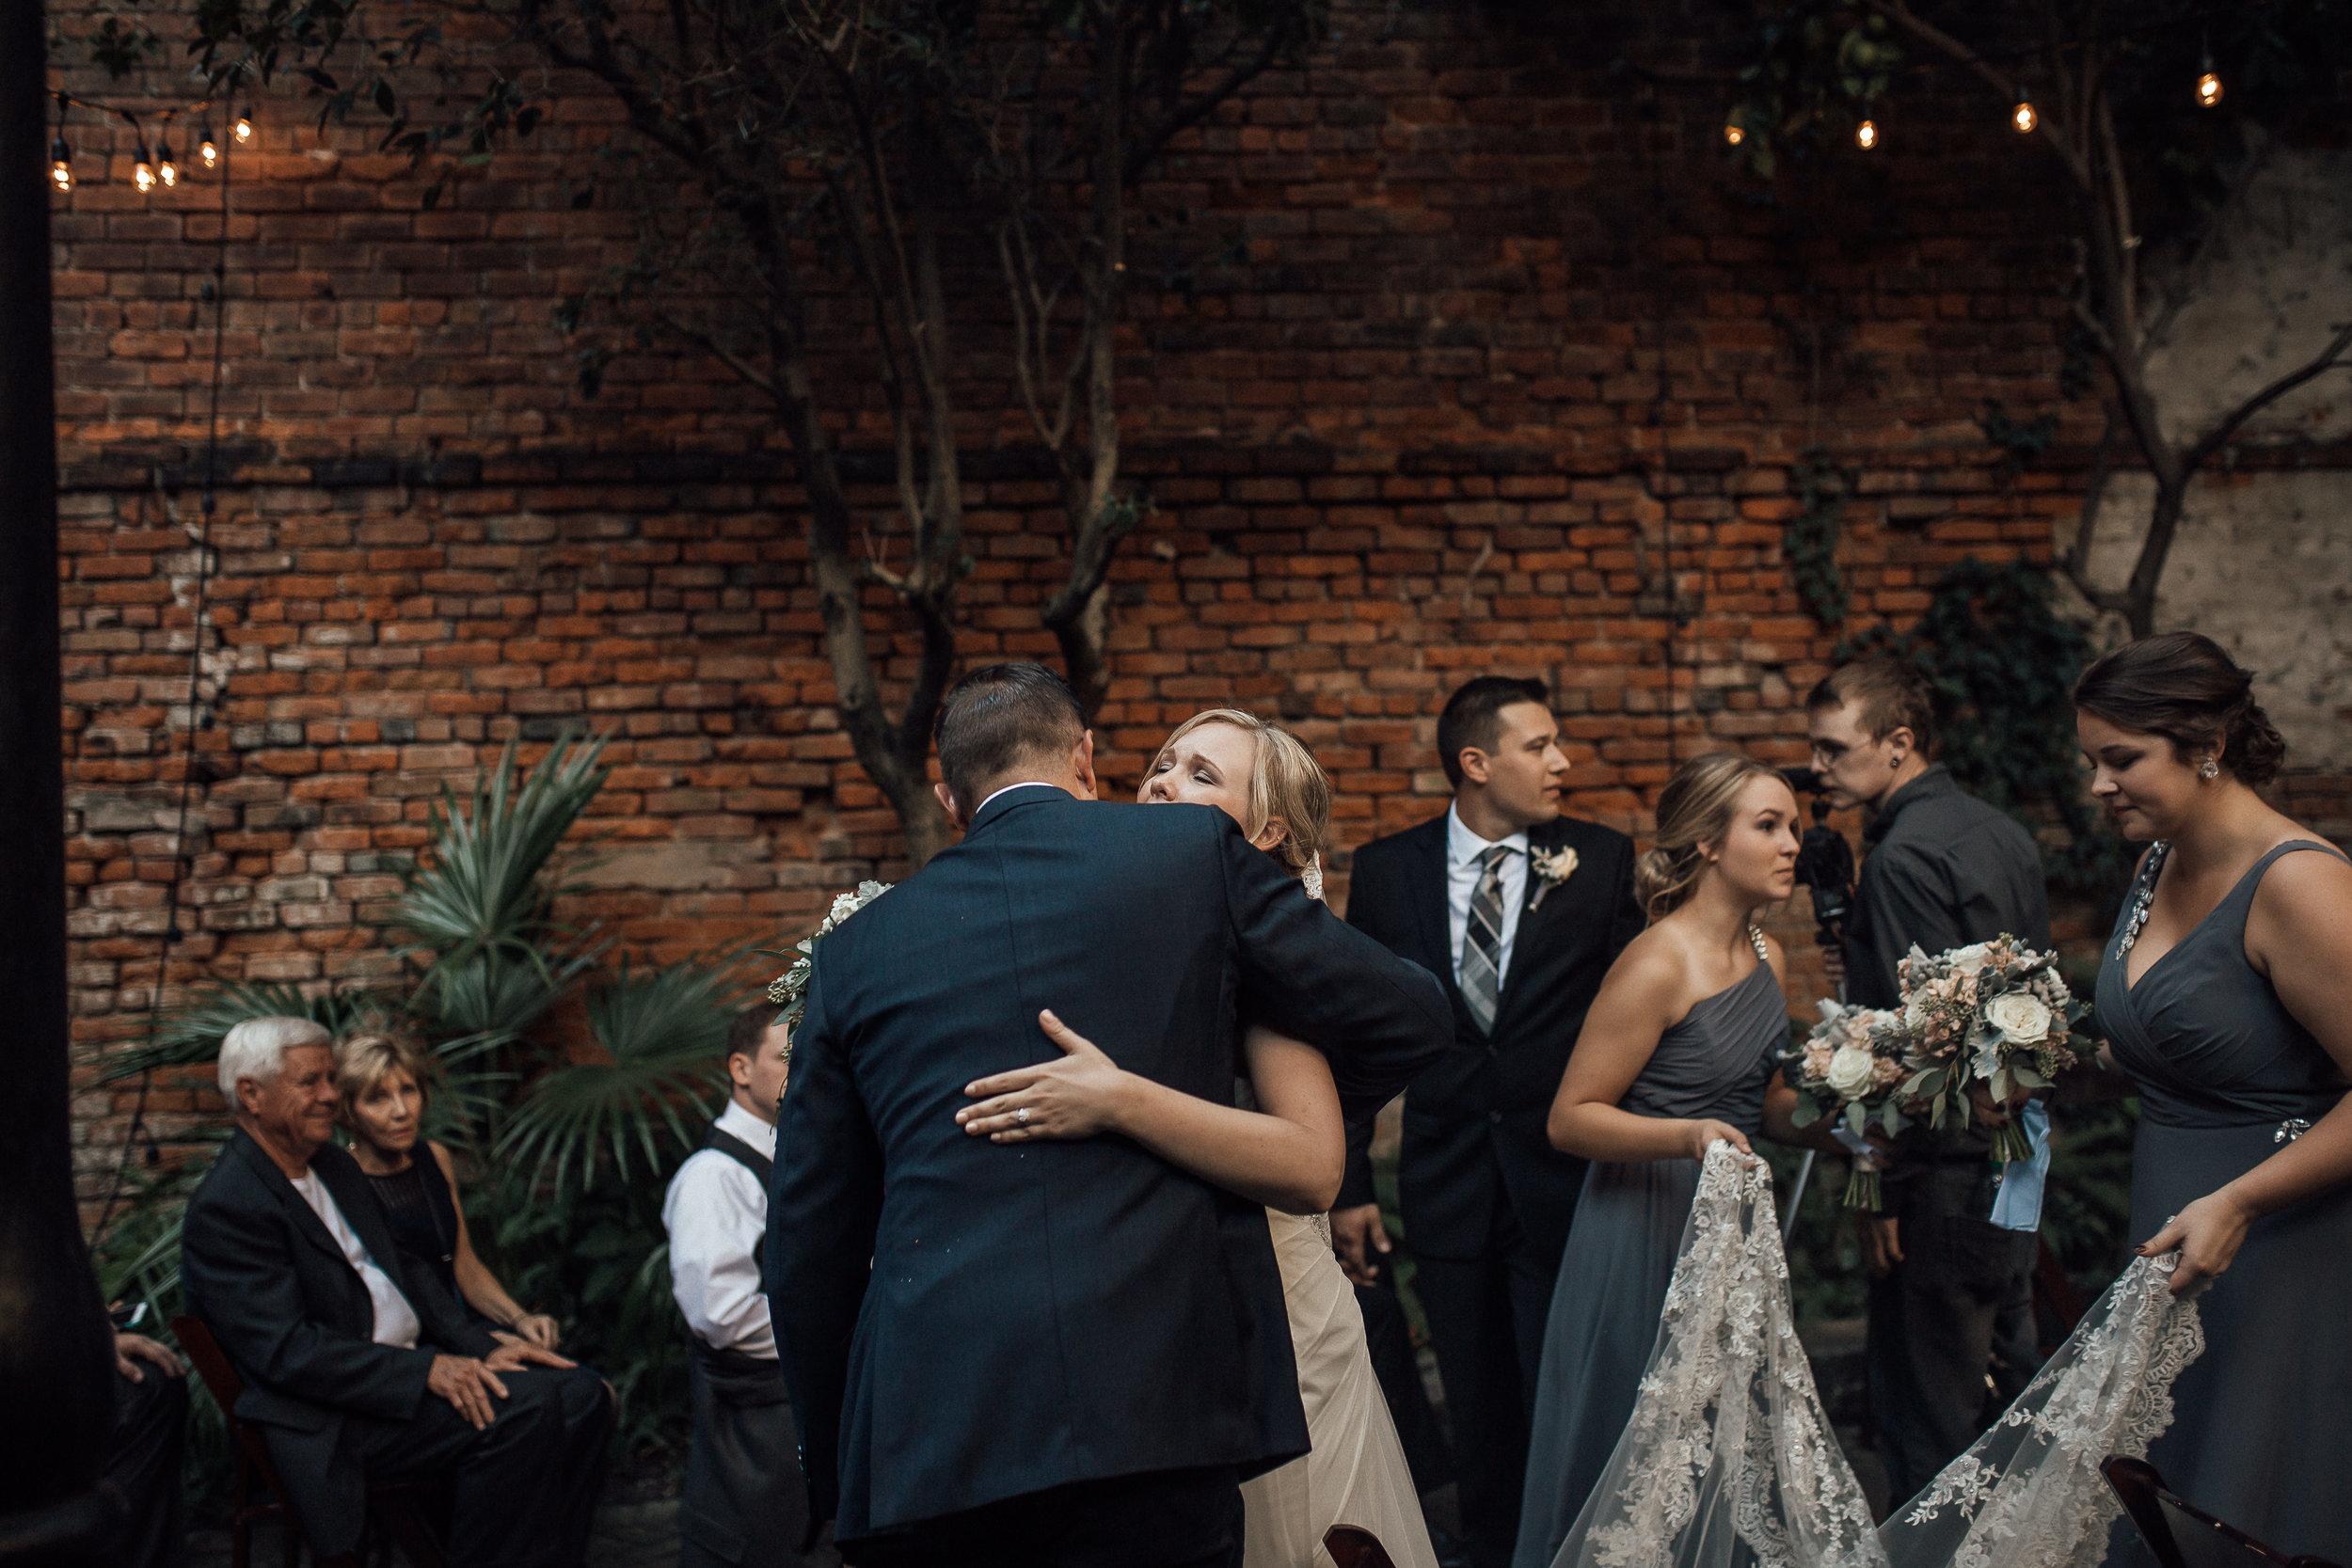 new-orleans-pharmacy-museum-new-orleans-wedding-cassie-cook-photography-vargo-391.jpg